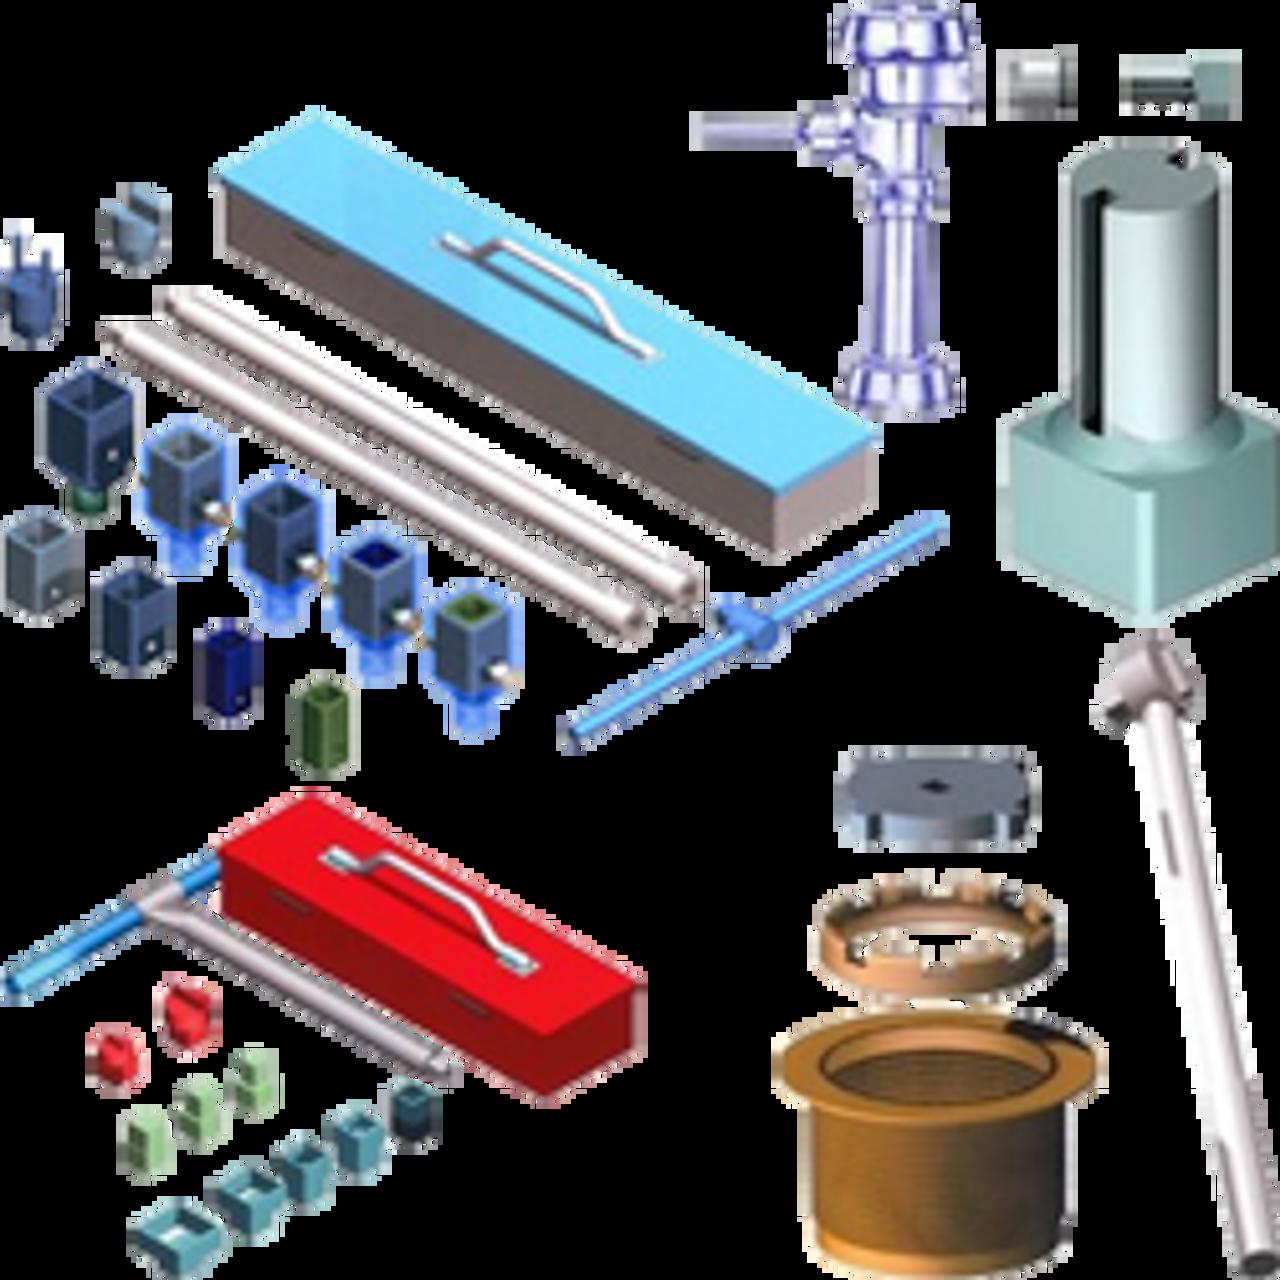 Plumbing Specialty Tools | Heavy Duty Supplies